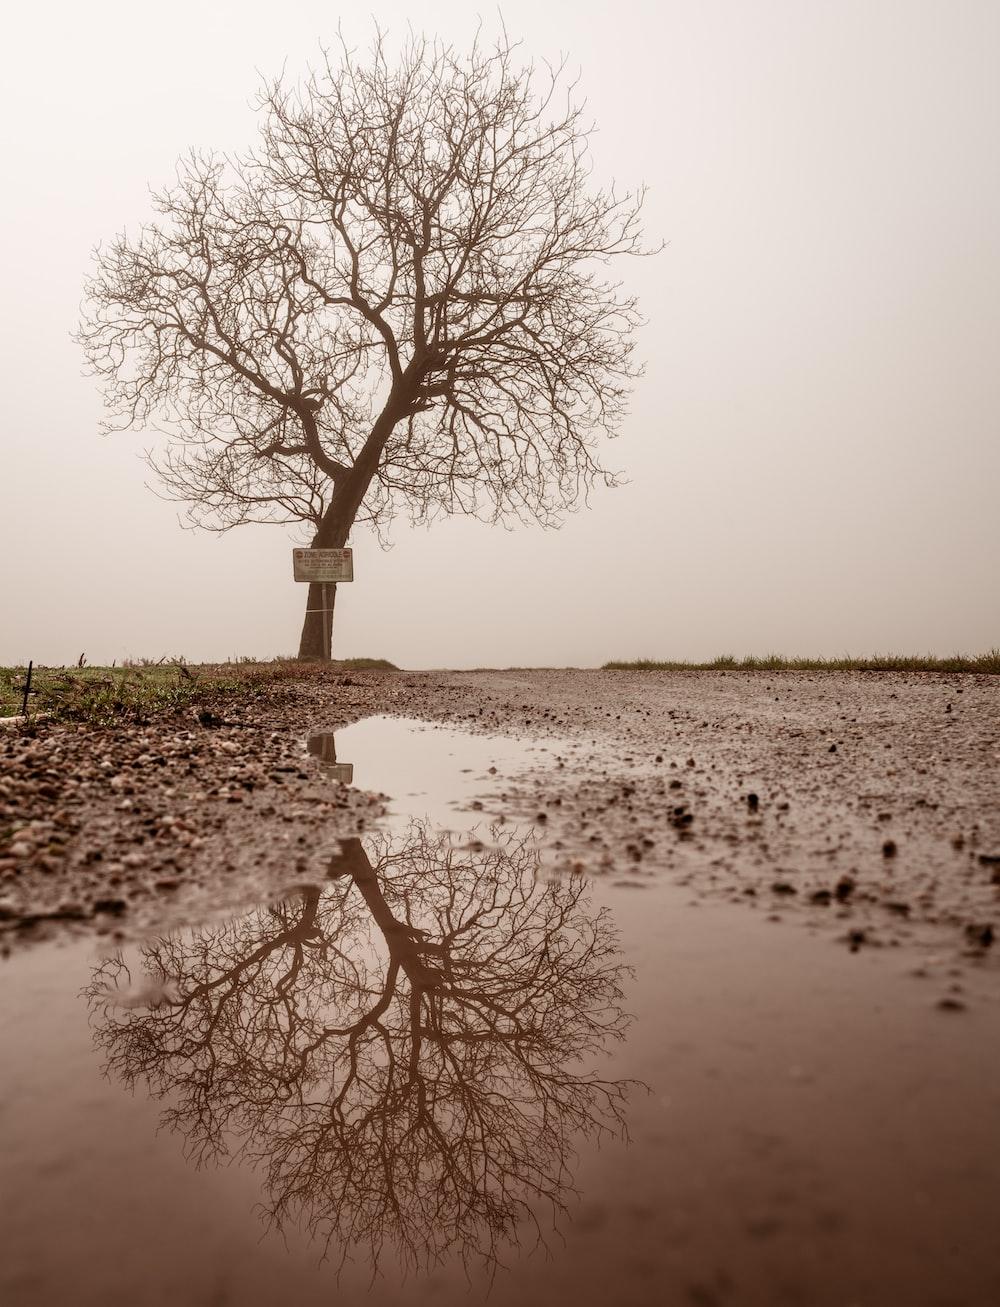 leafless tree beside pathway under gray sky